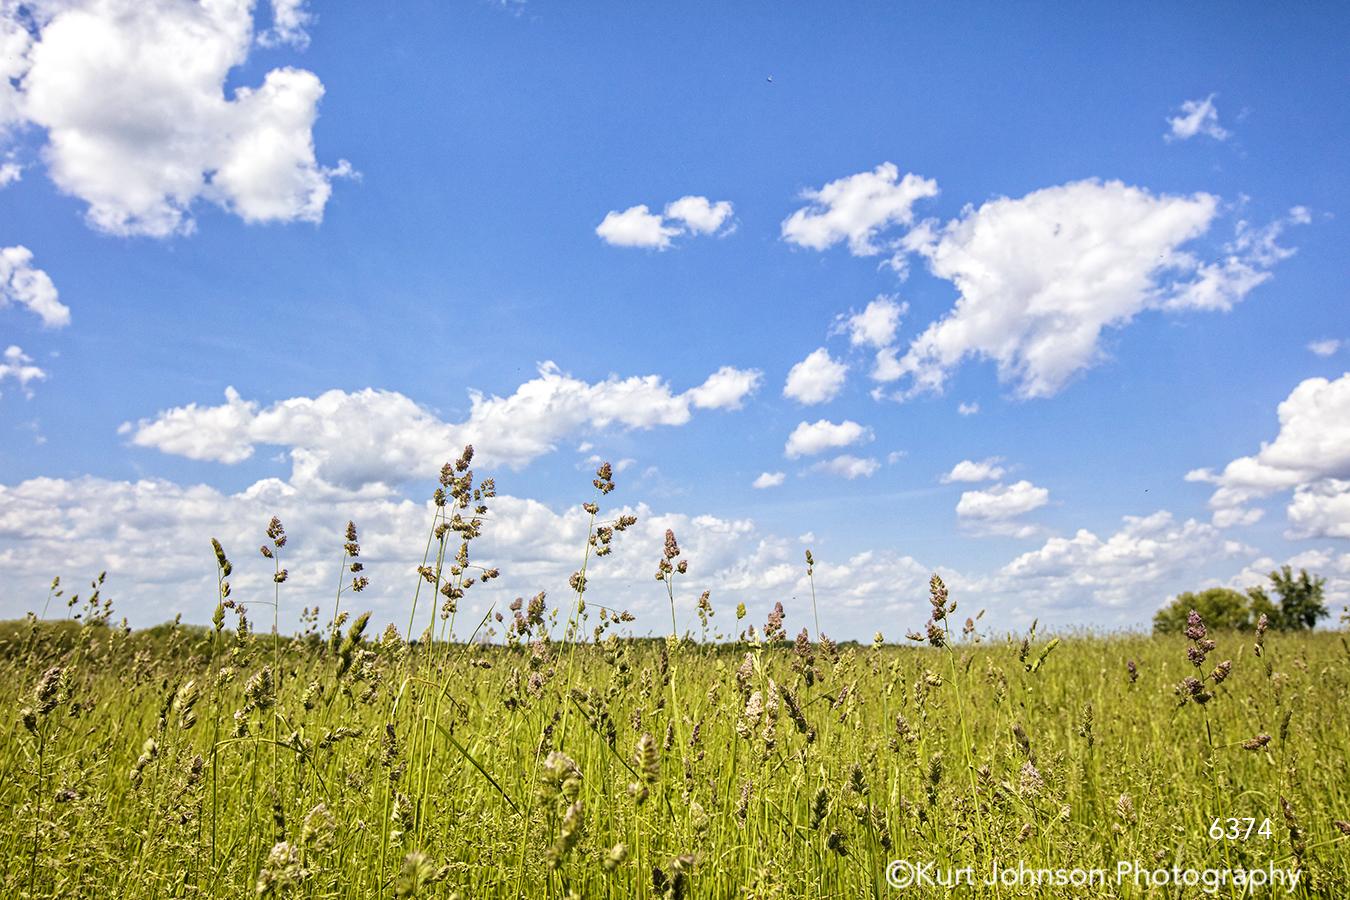 green grass grasses wheat field blue sky clouds landscape